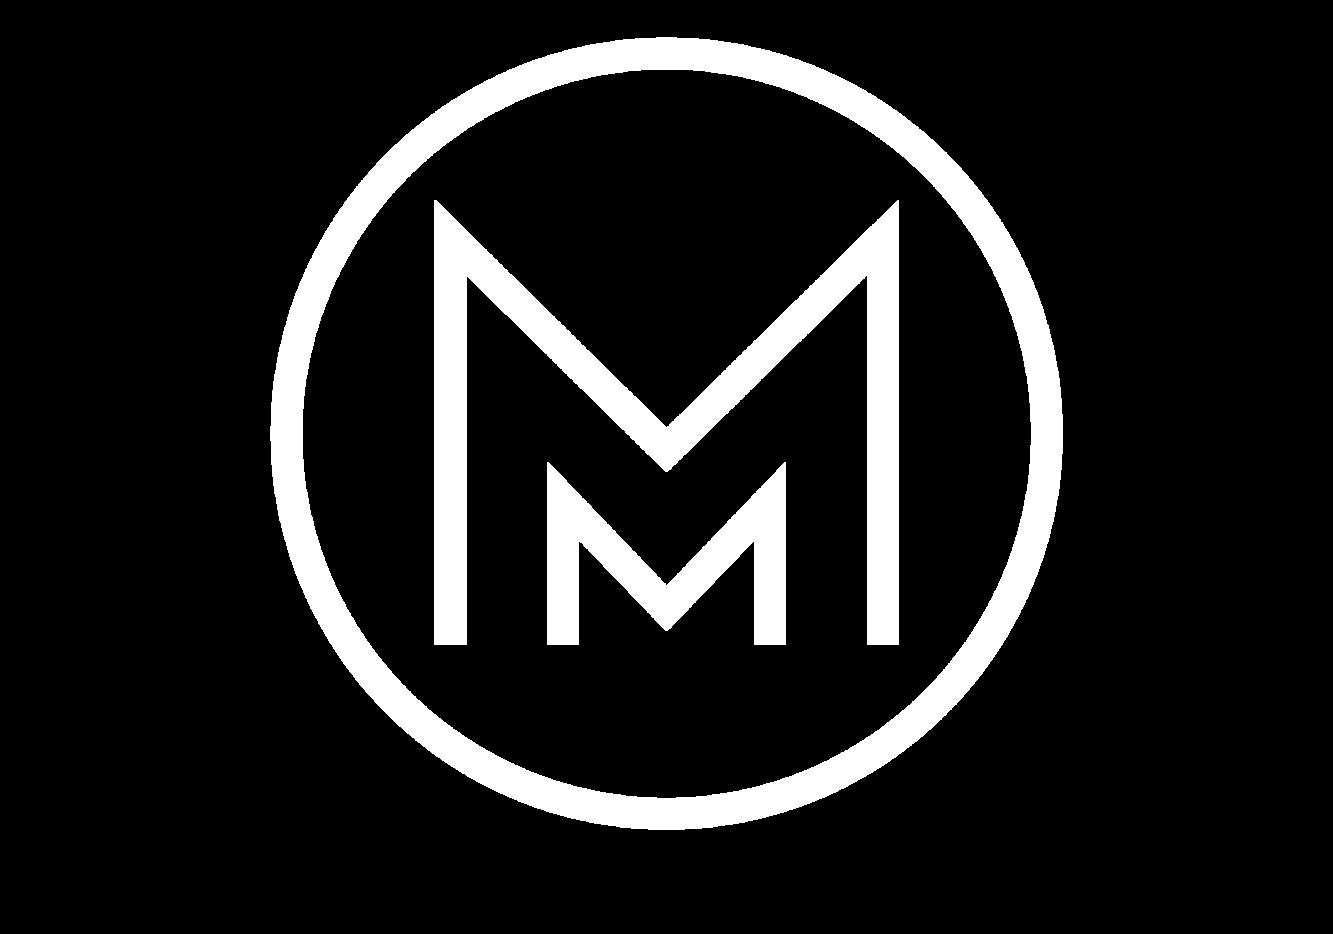 M midtown.png